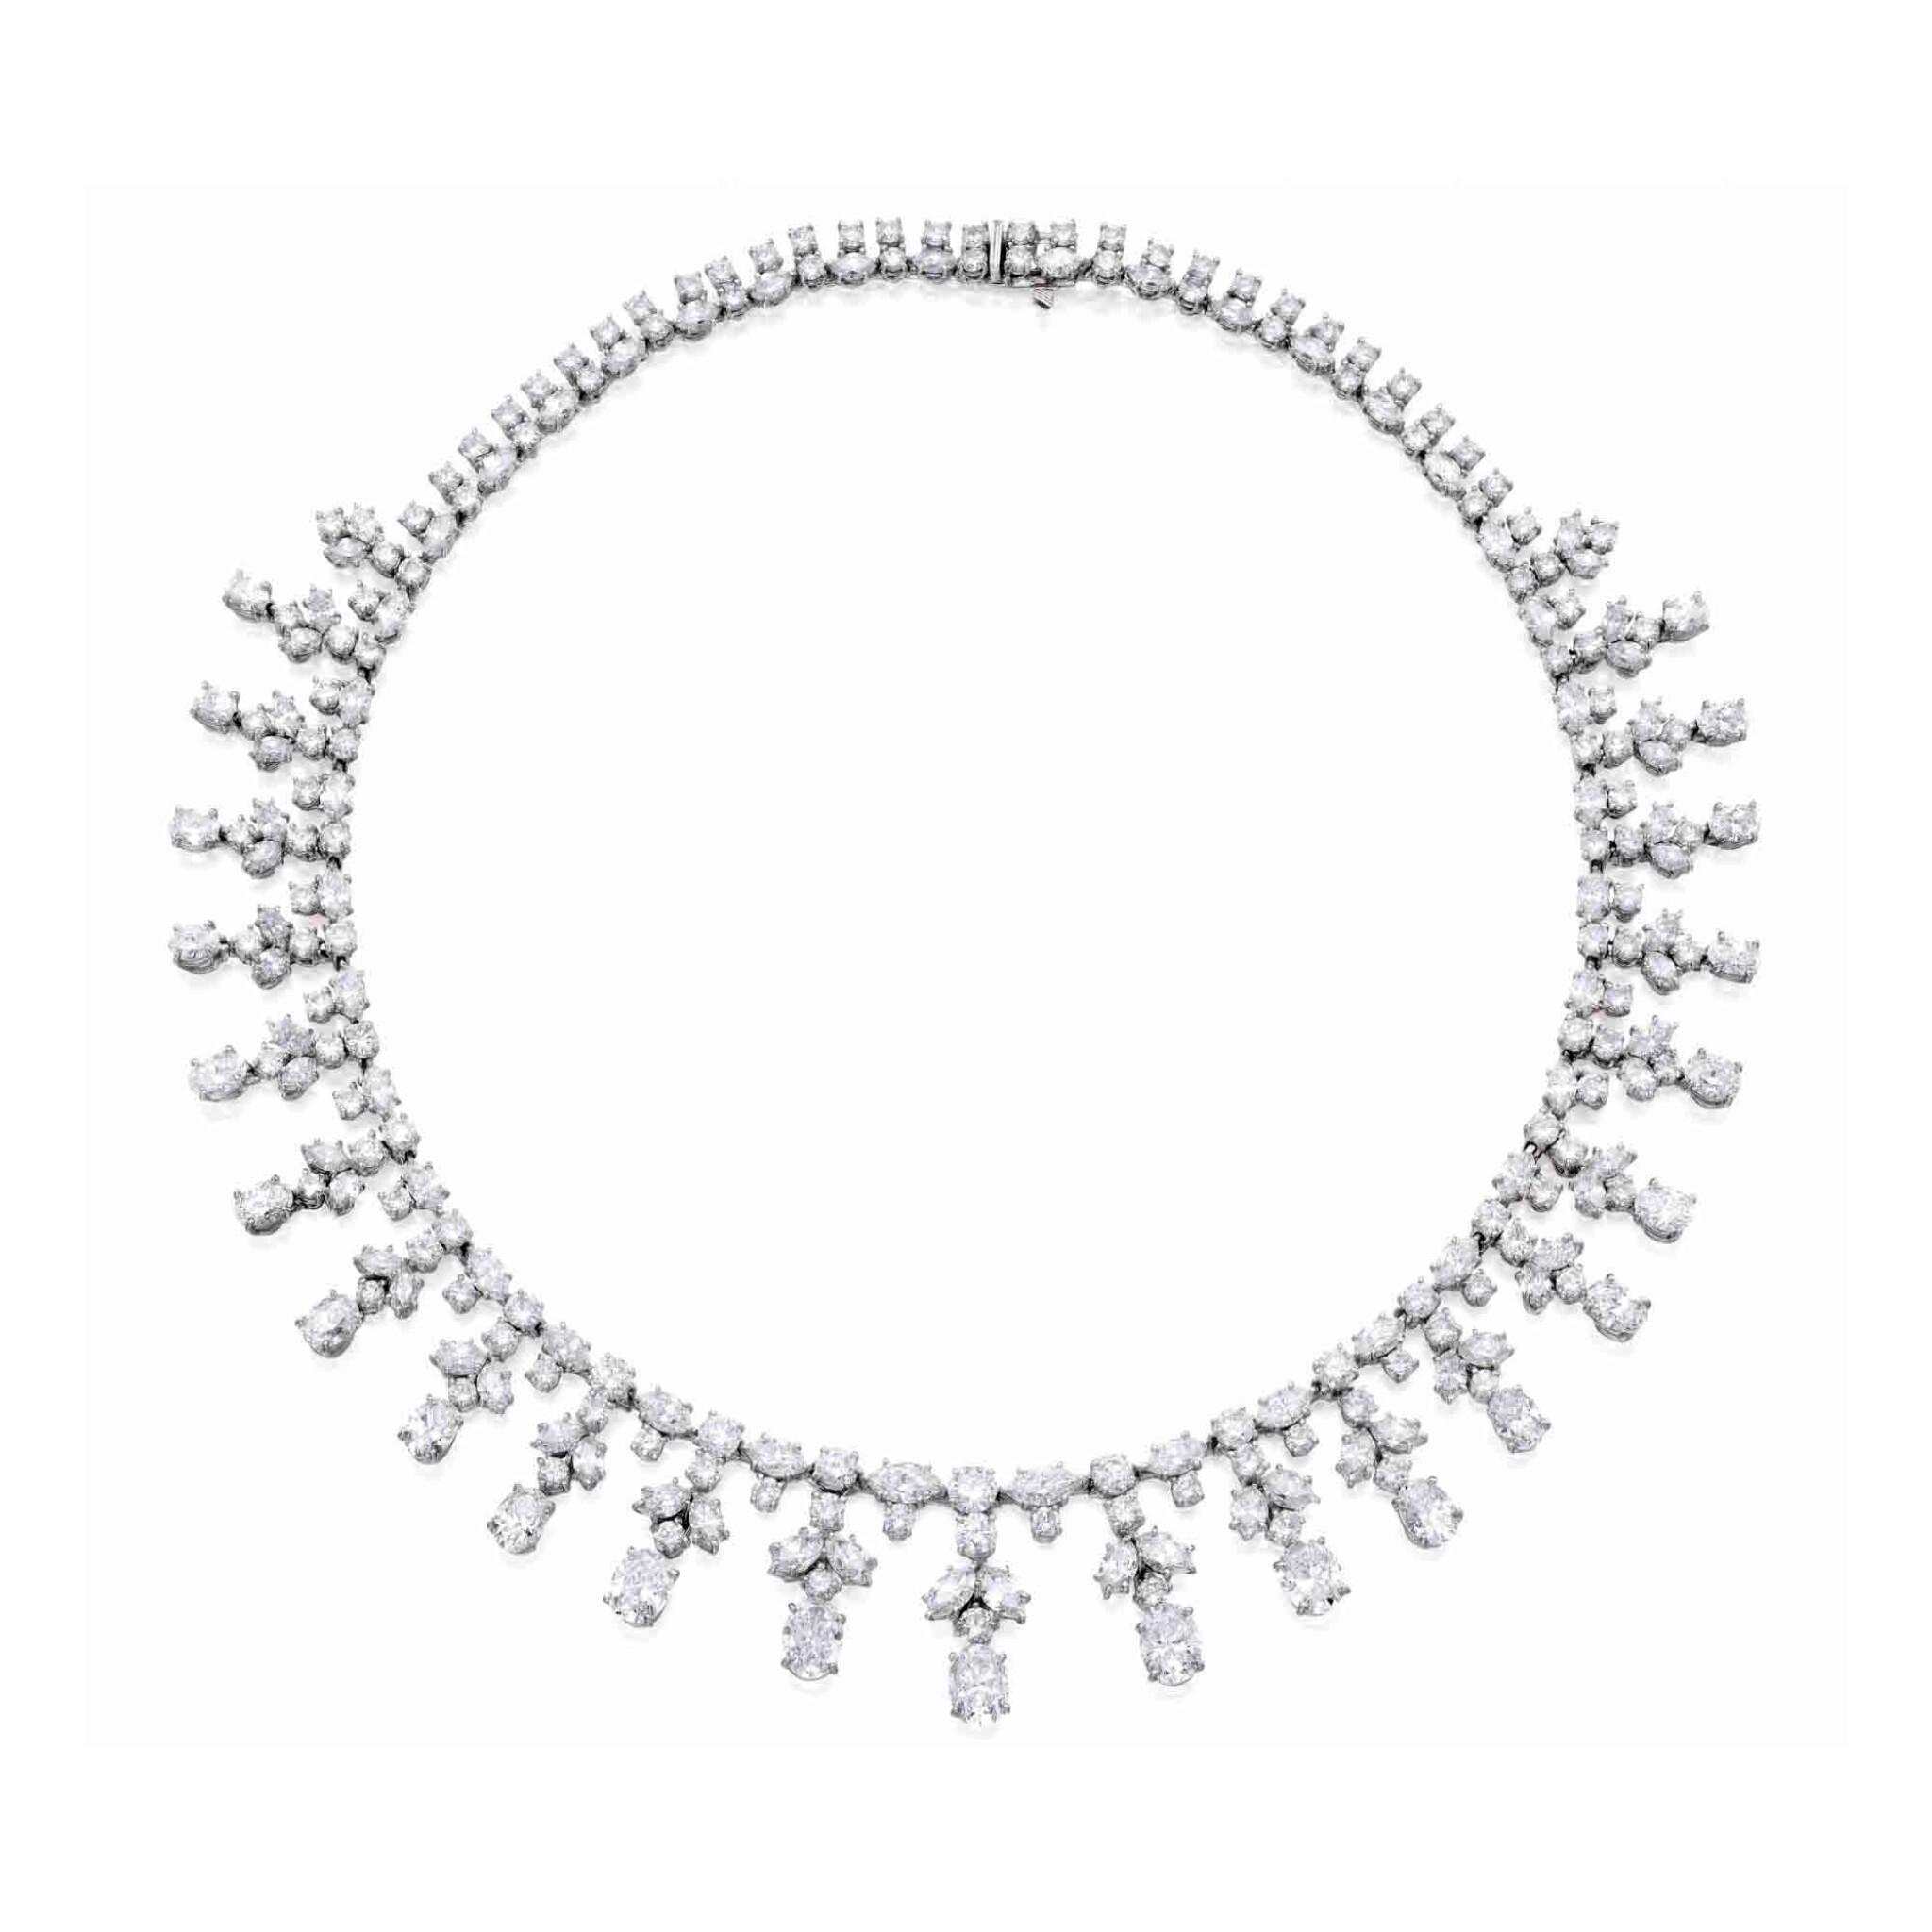 View full screen - View 1 of Lot 11. Harry Winston [海瑞溫斯頓] | Diamond Necklace [鑽石項鏈].